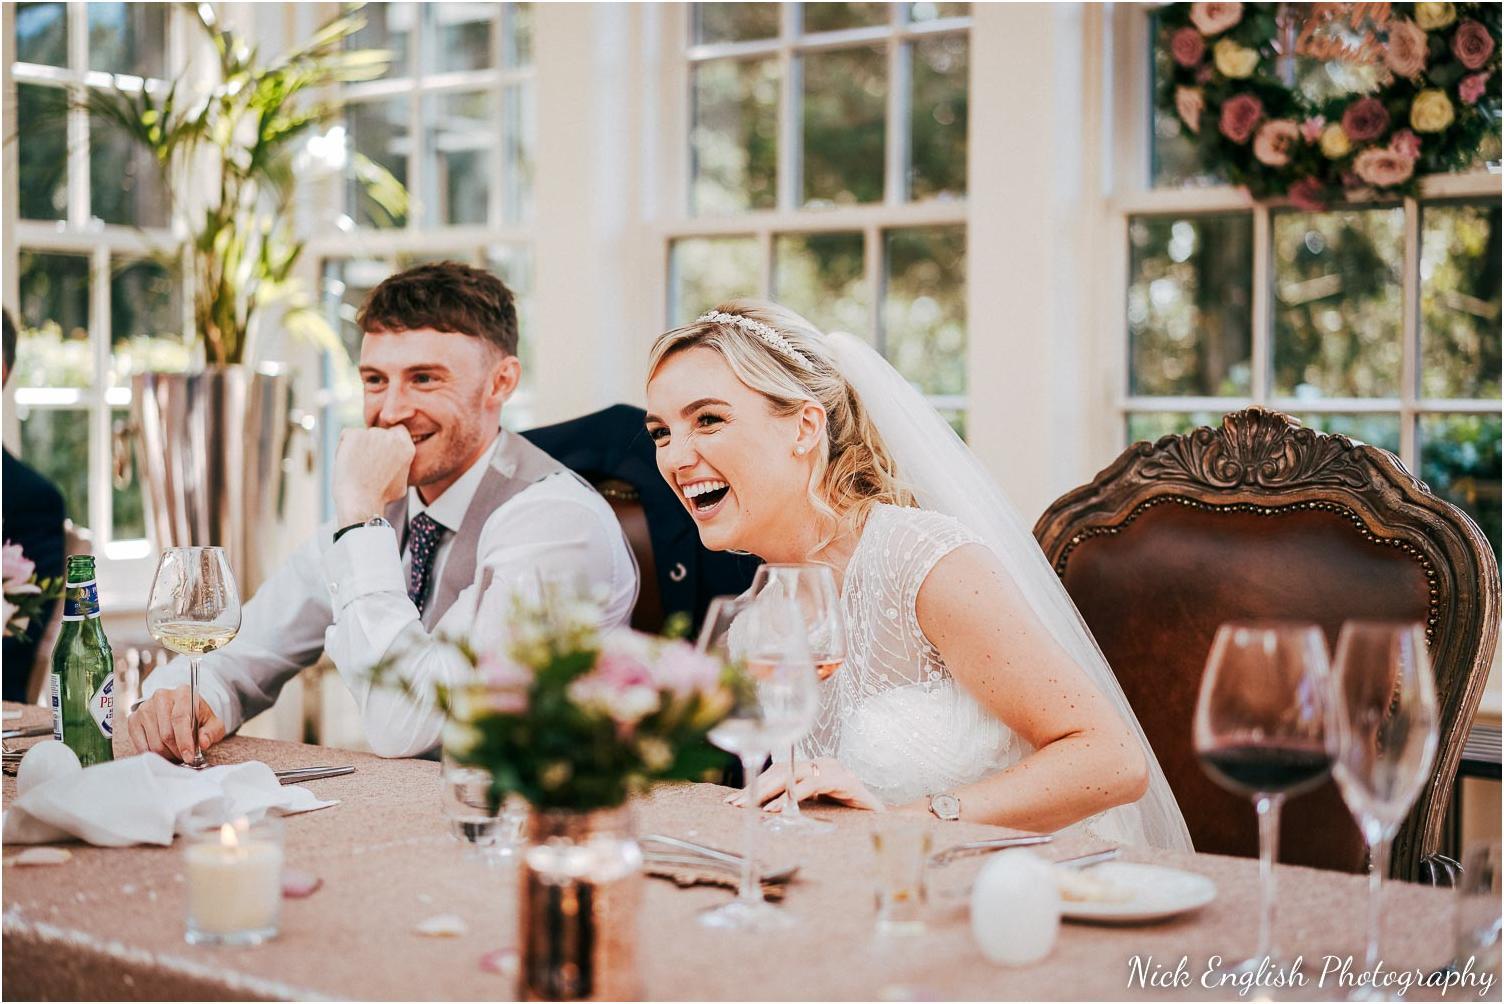 Mitton_Hall_Wedding_Photograph-113.jpg